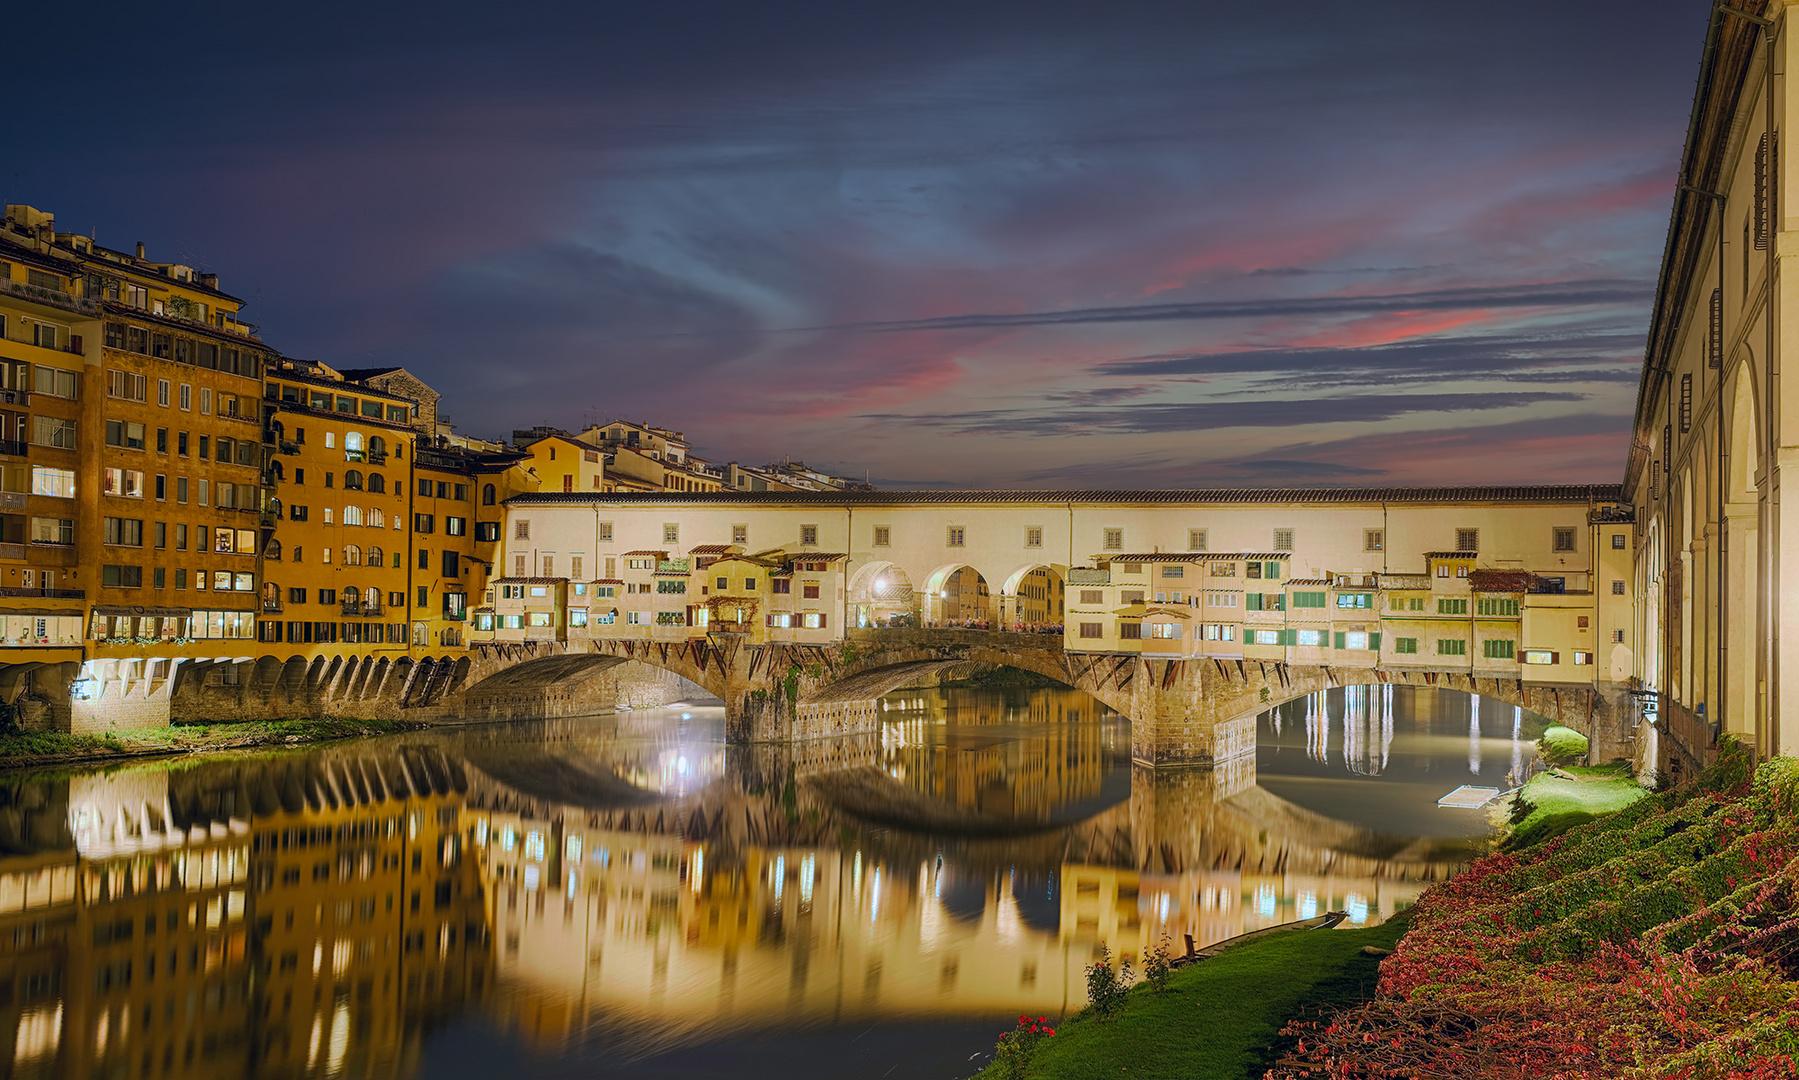 7179M-85M Ponte Vecchio Florenz beleuchtet Abendrot Panorama